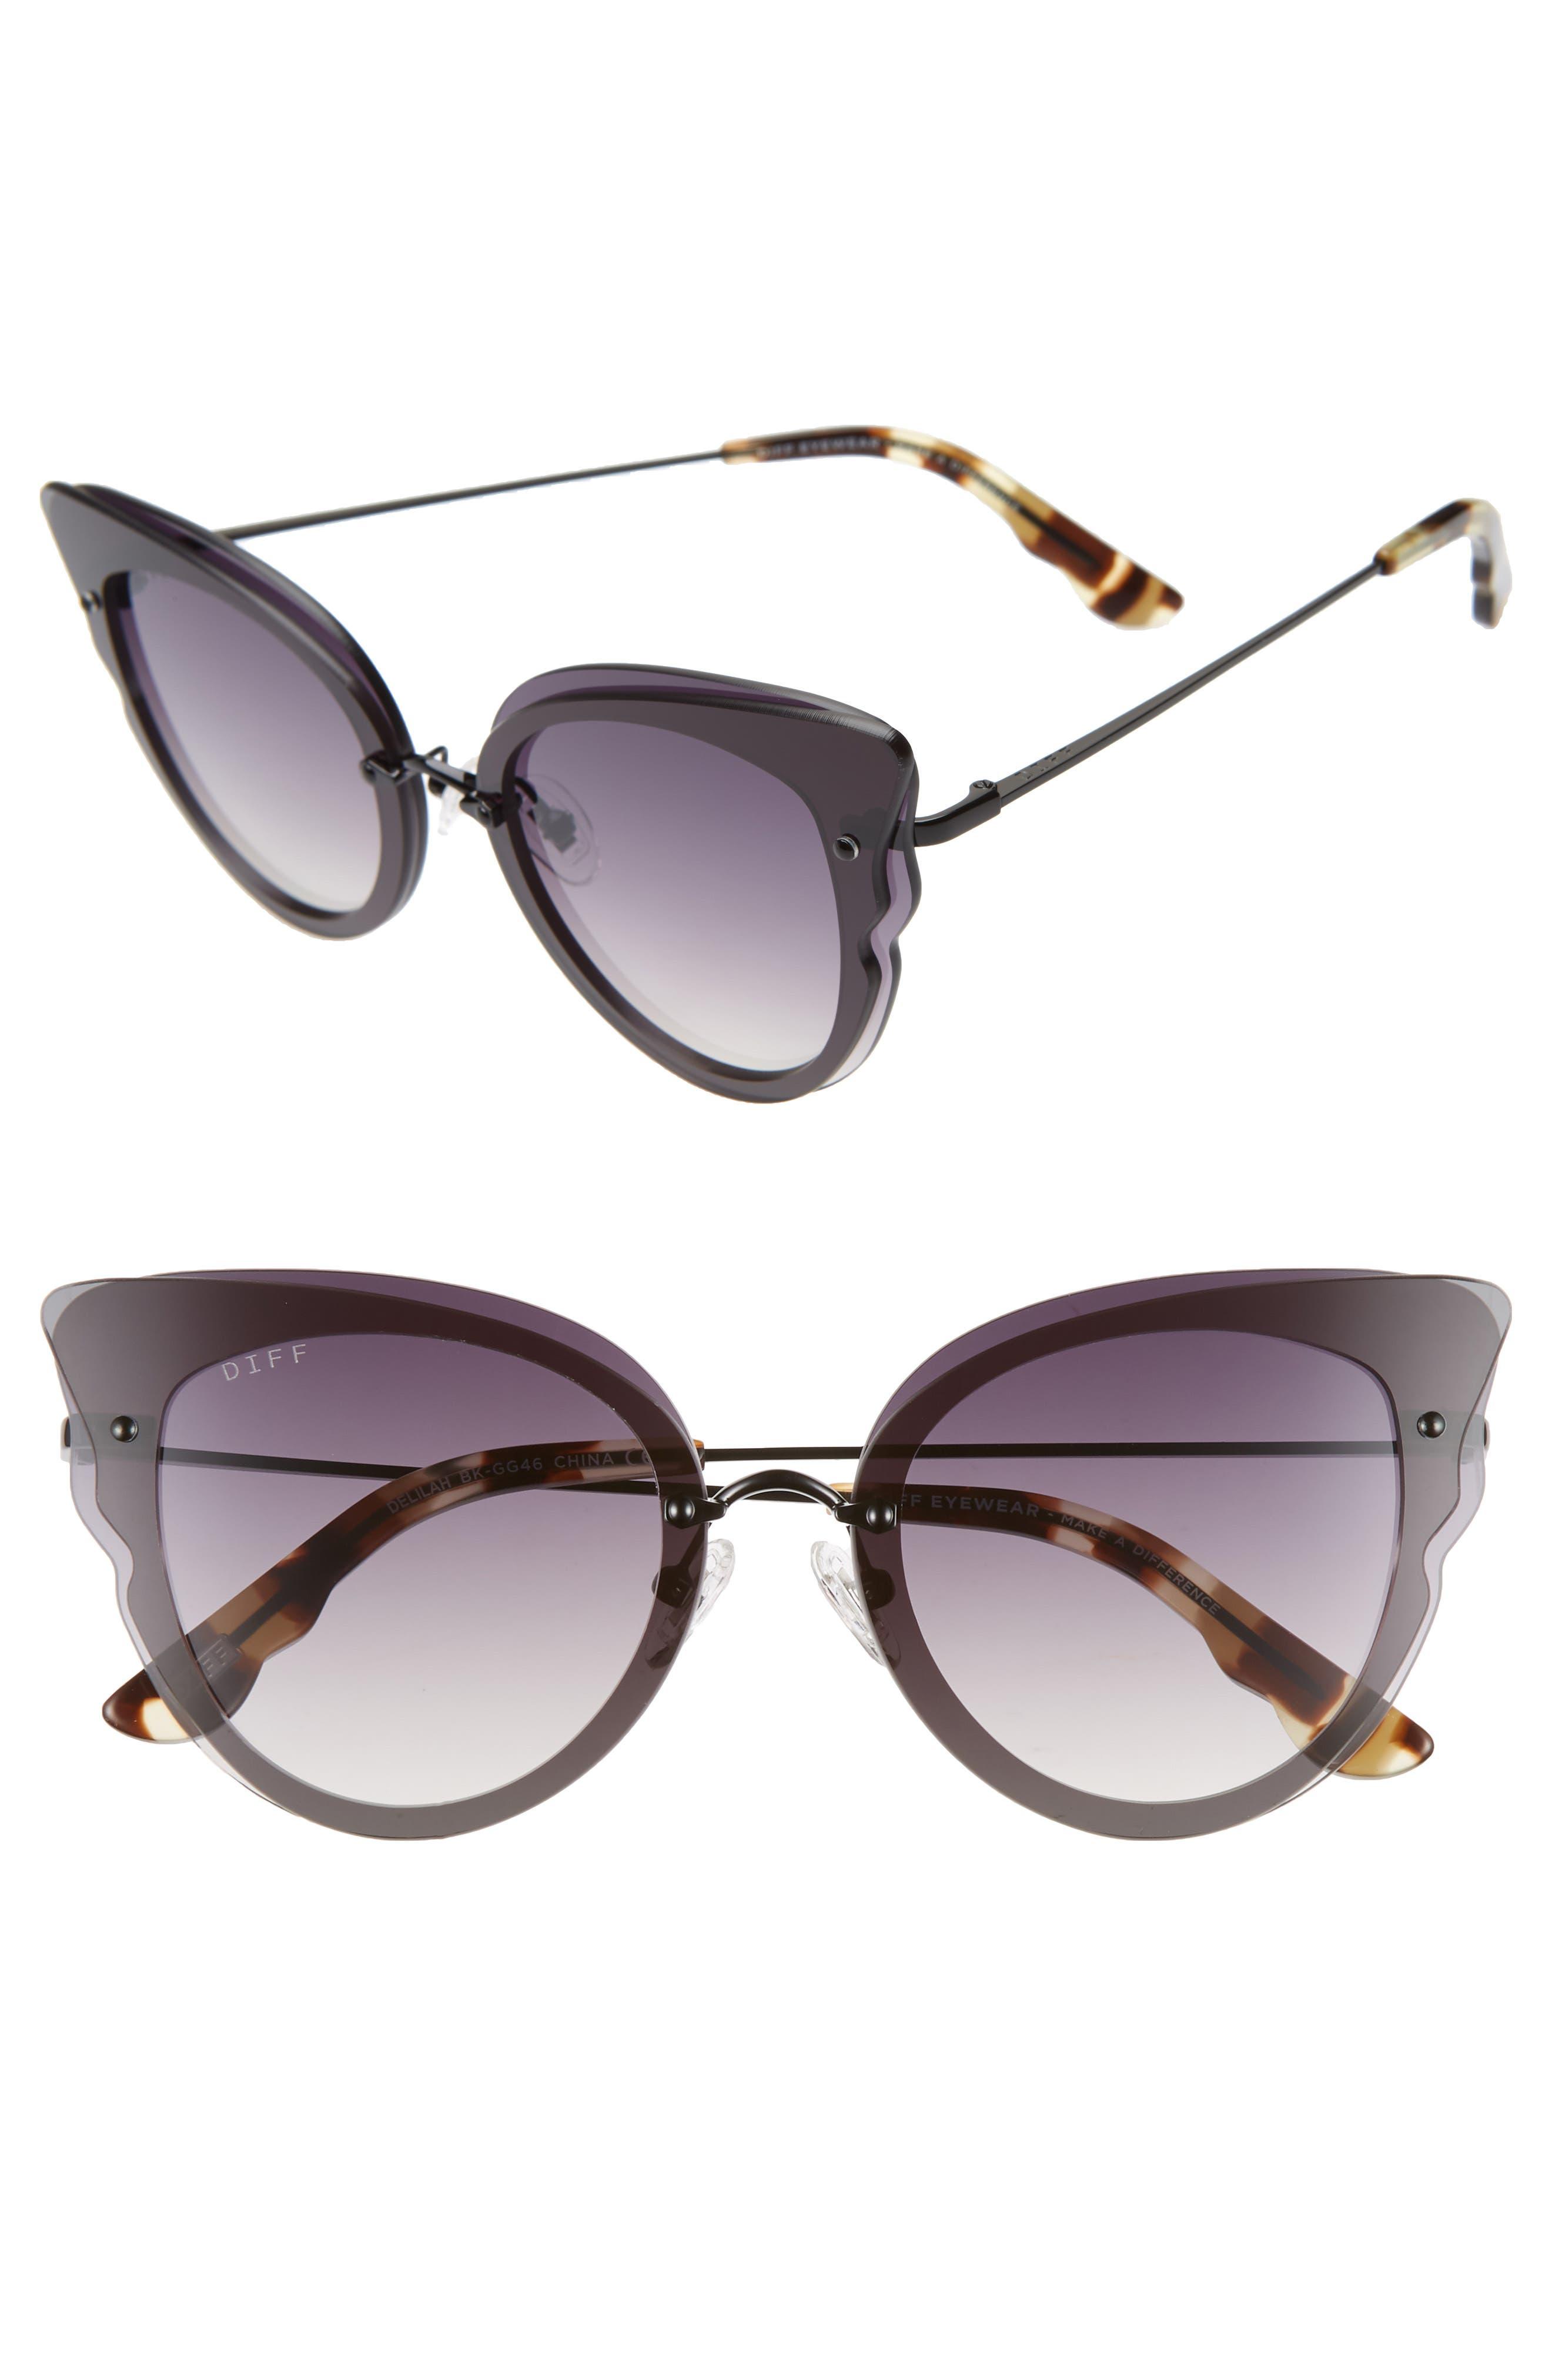 Delilah 49mm Cat Eye Sunglasses,                             Main thumbnail 1, color,                             BLACK/ GREY